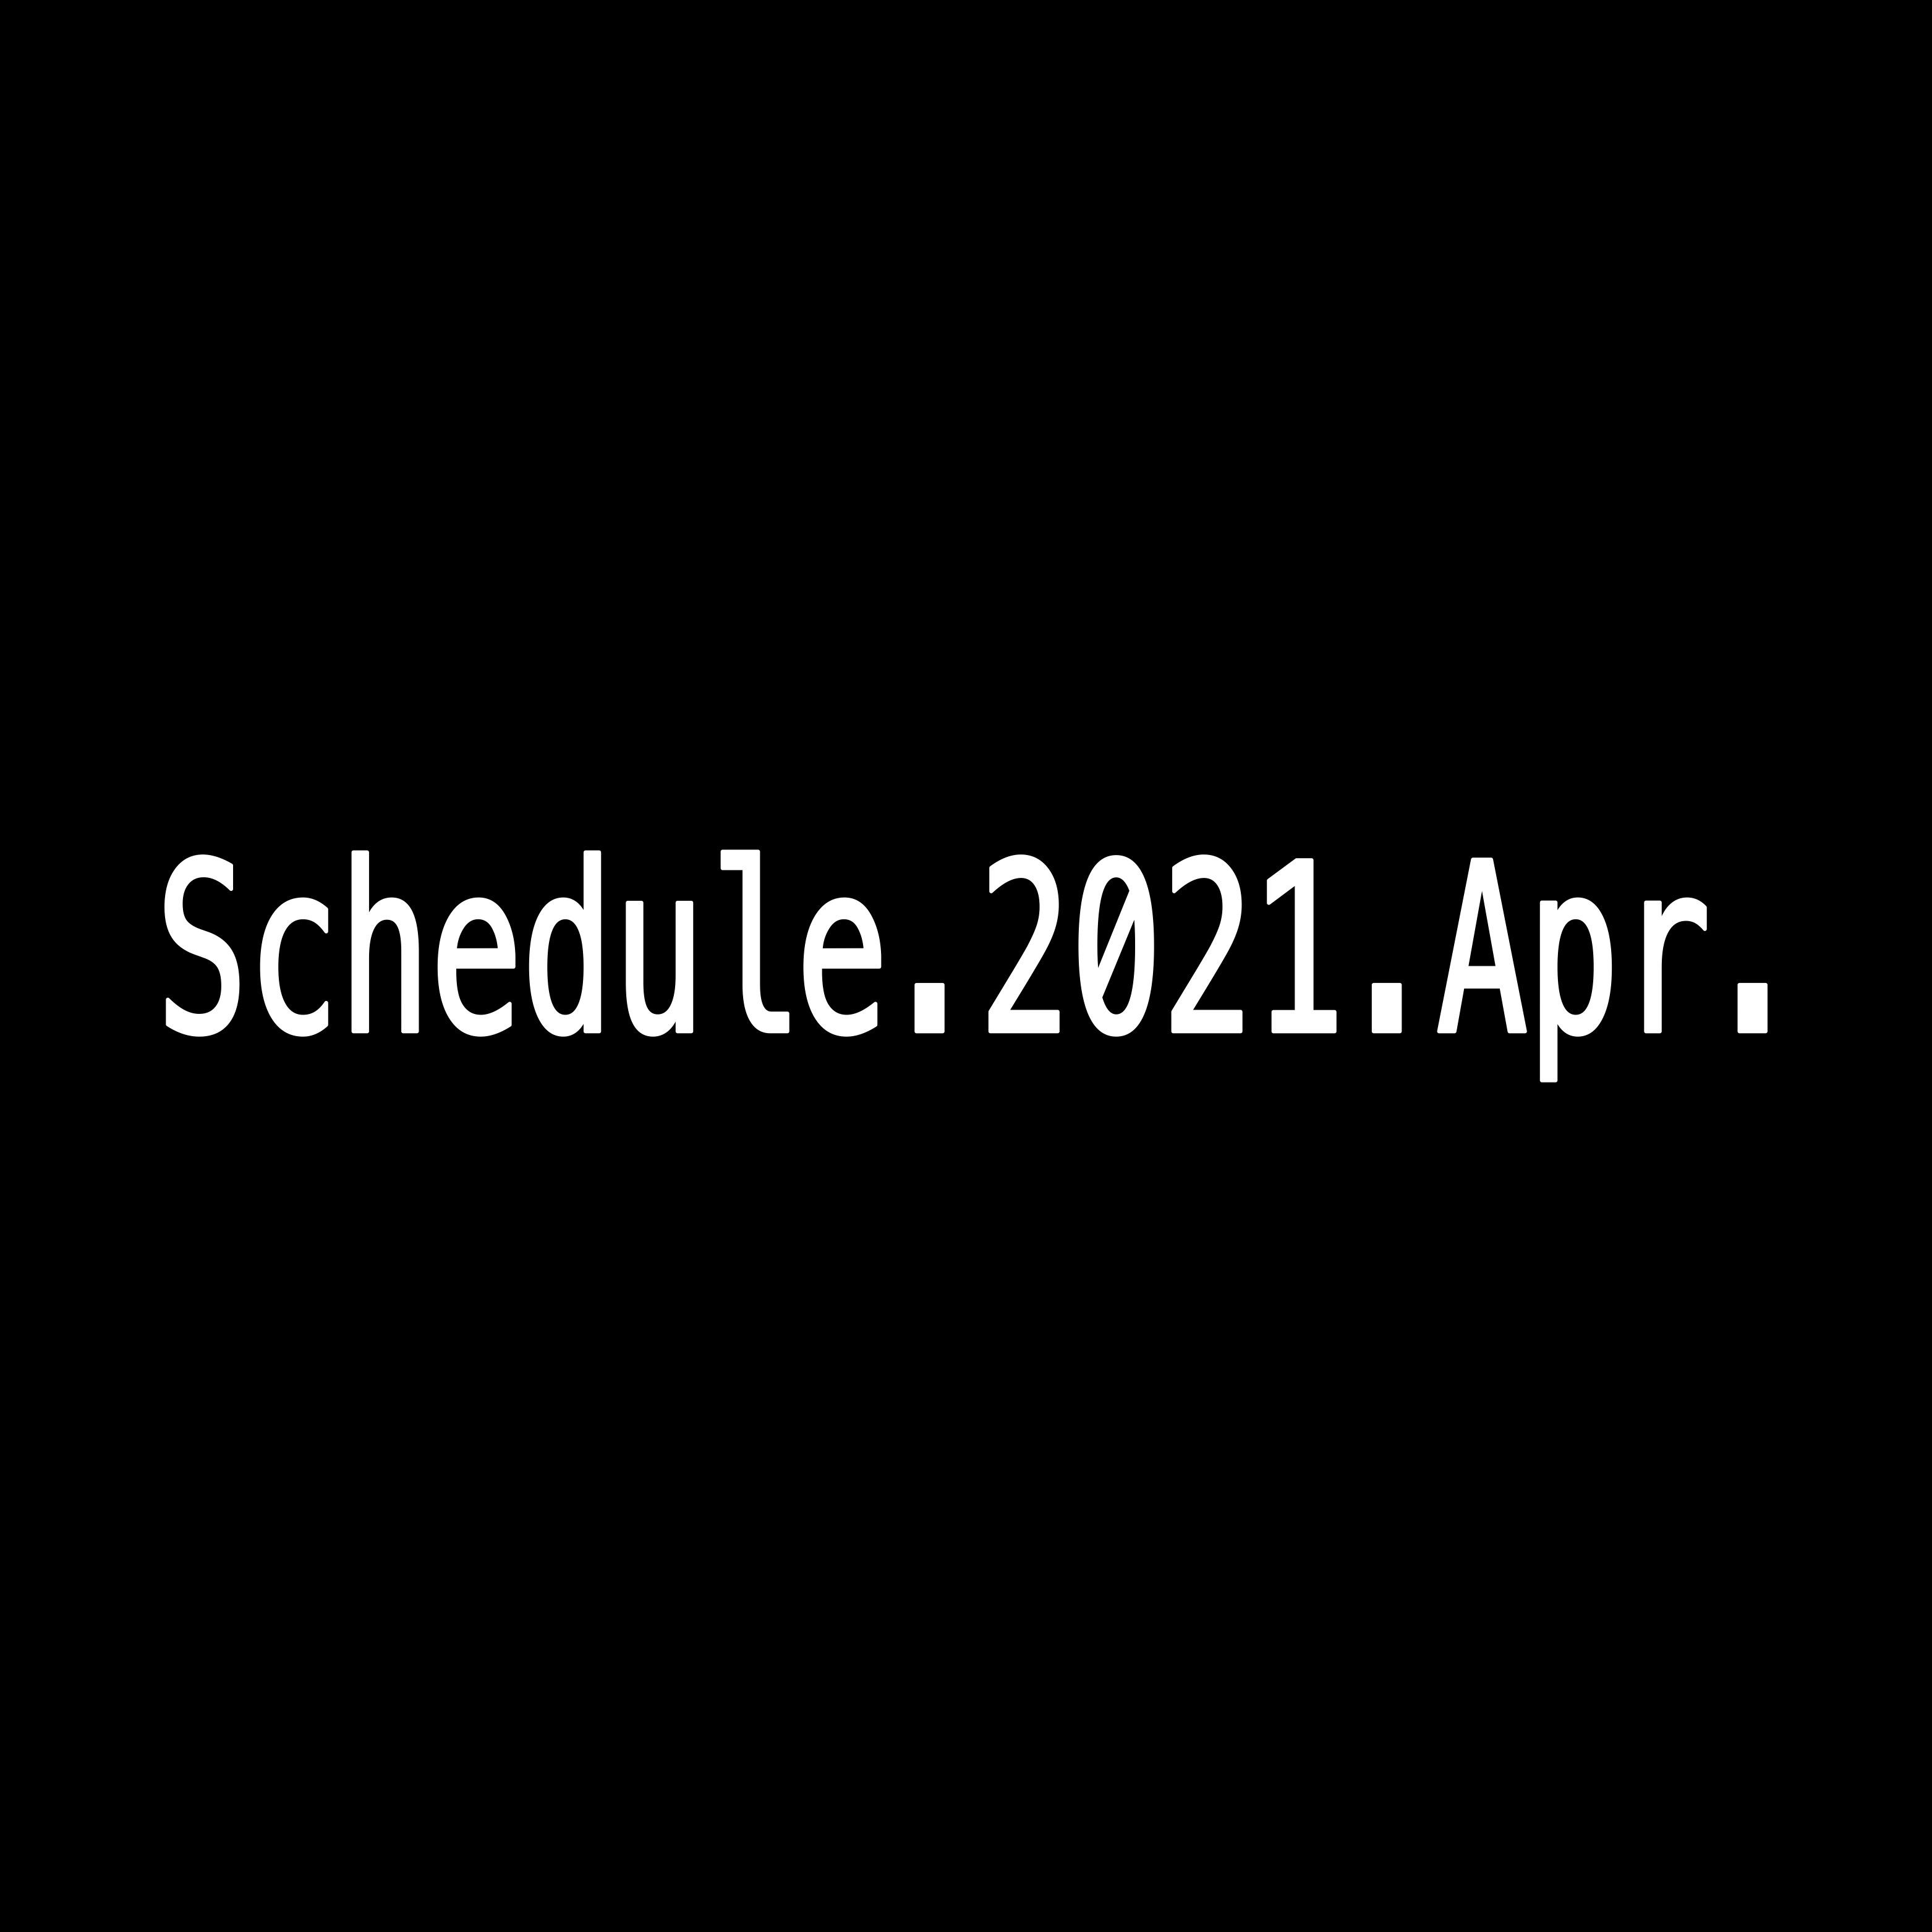 2021年4月Schedule